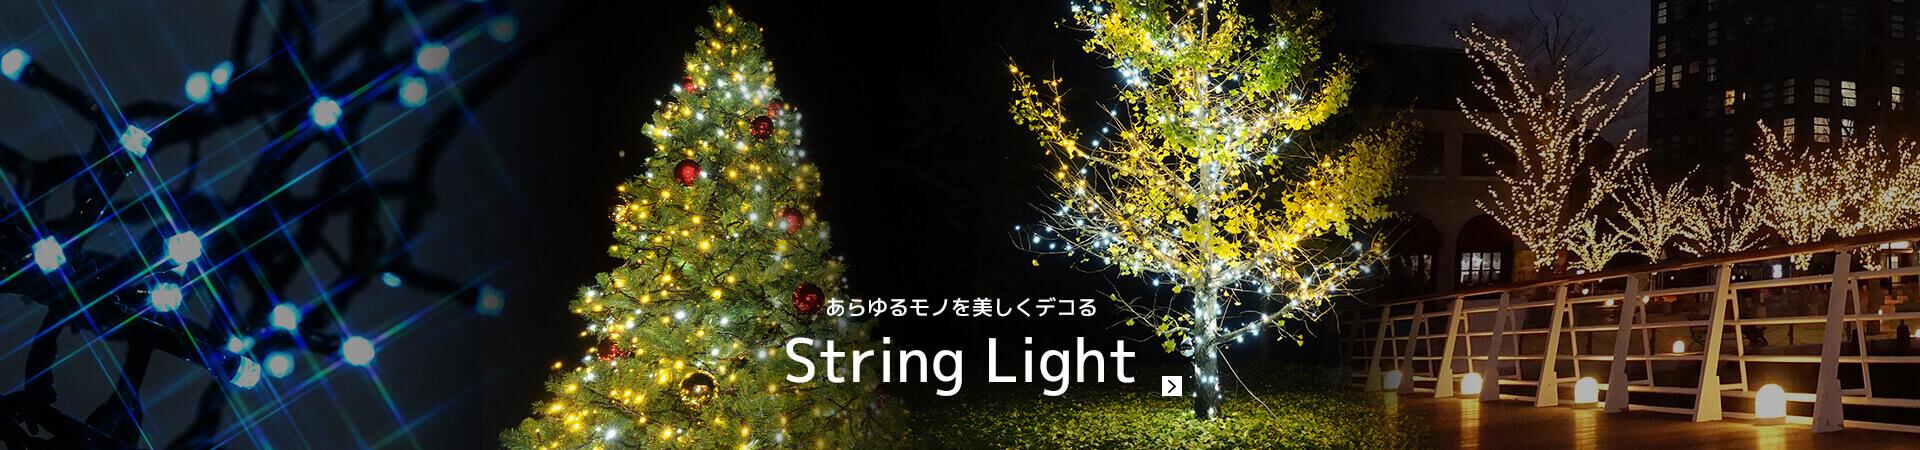 LEDイルミネーション電飾 ストリングライトライト